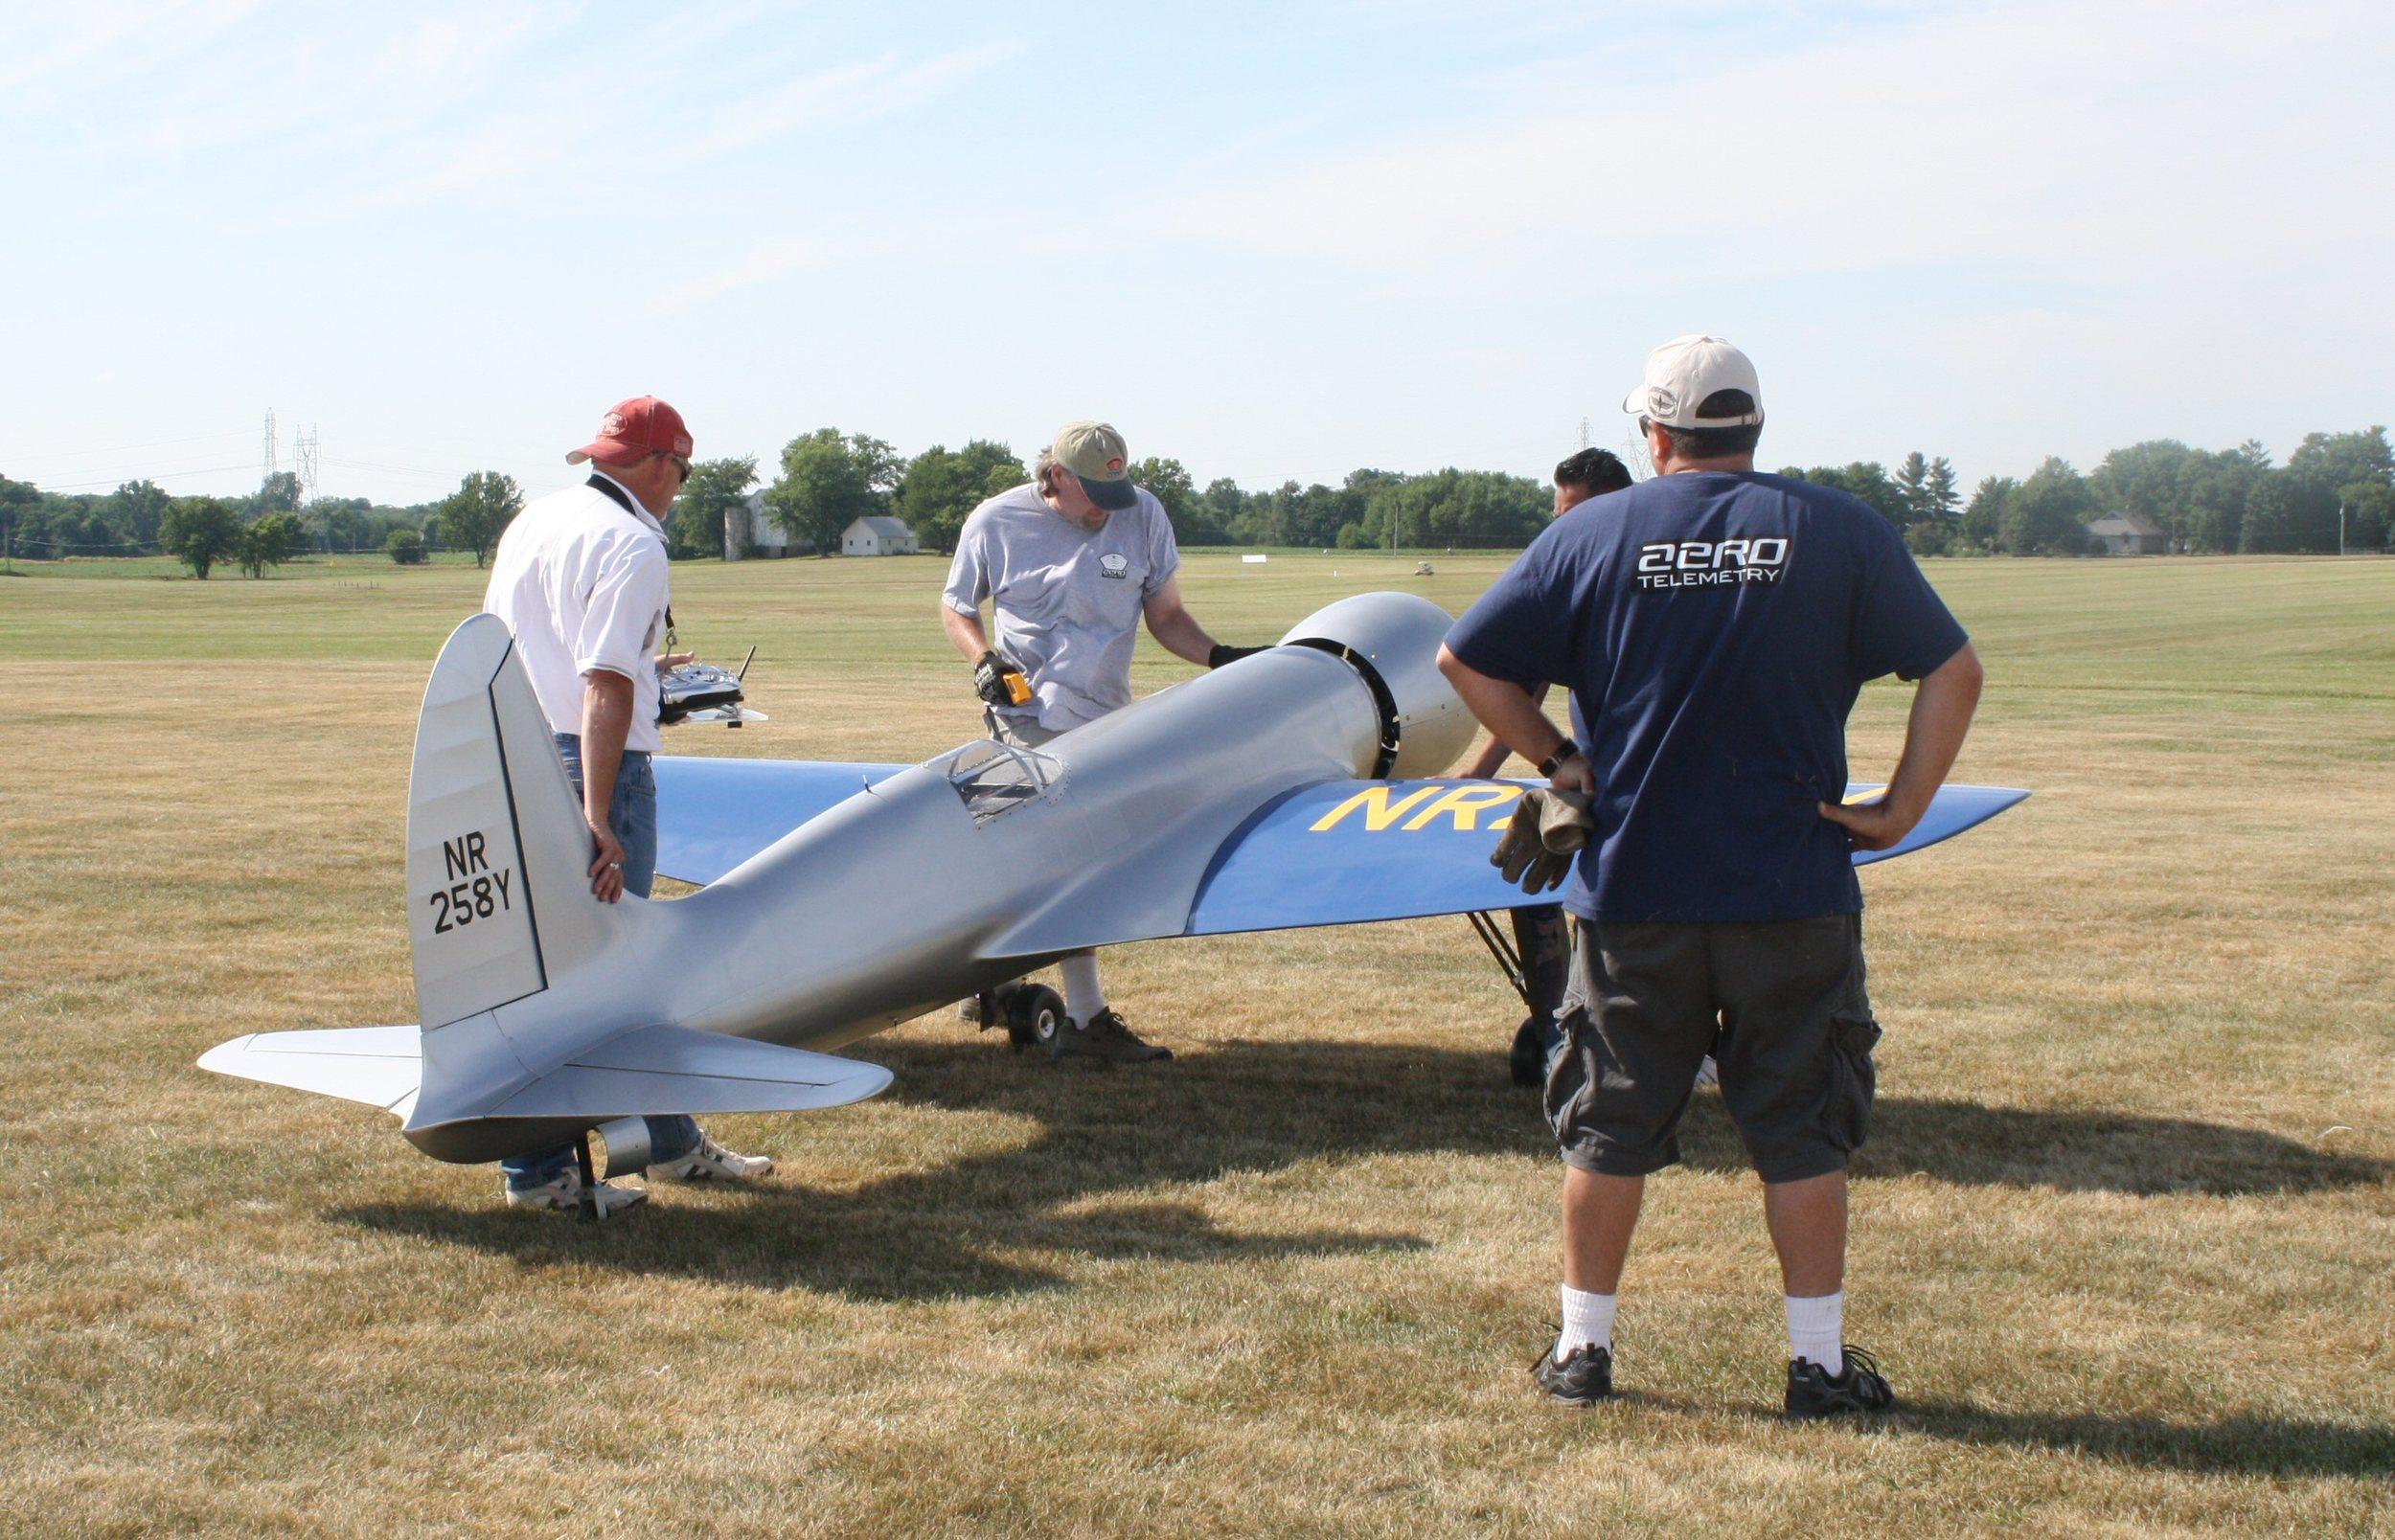 Aero H1 Racer AMA 75th